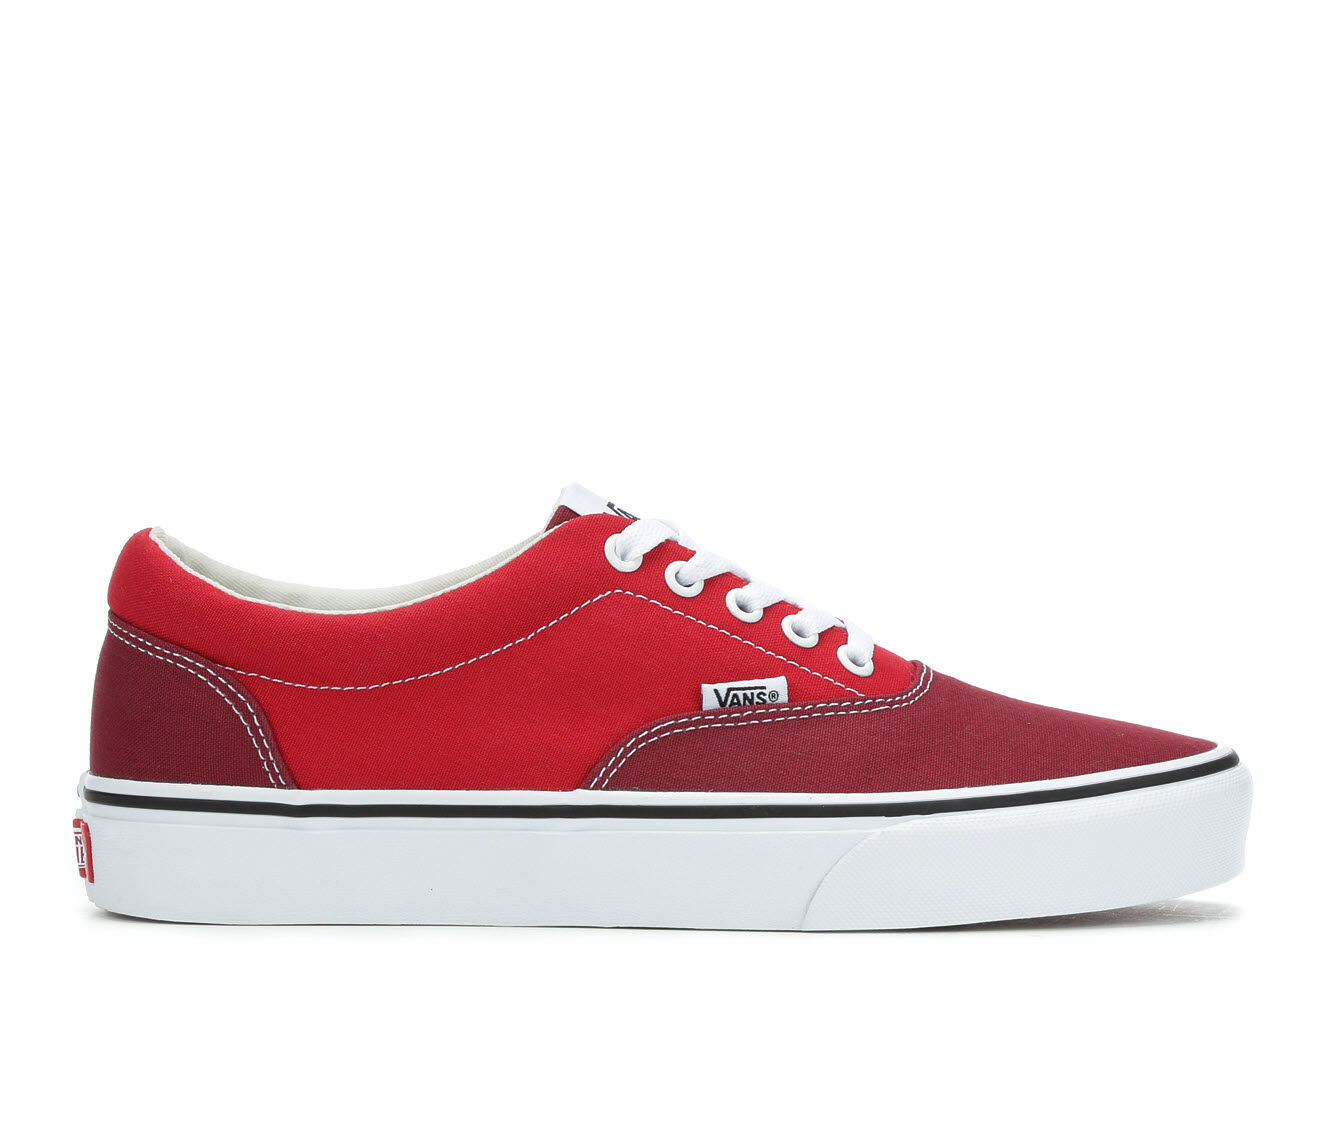 Men's Vans Doheny Skate Shoes Red/Burgundy